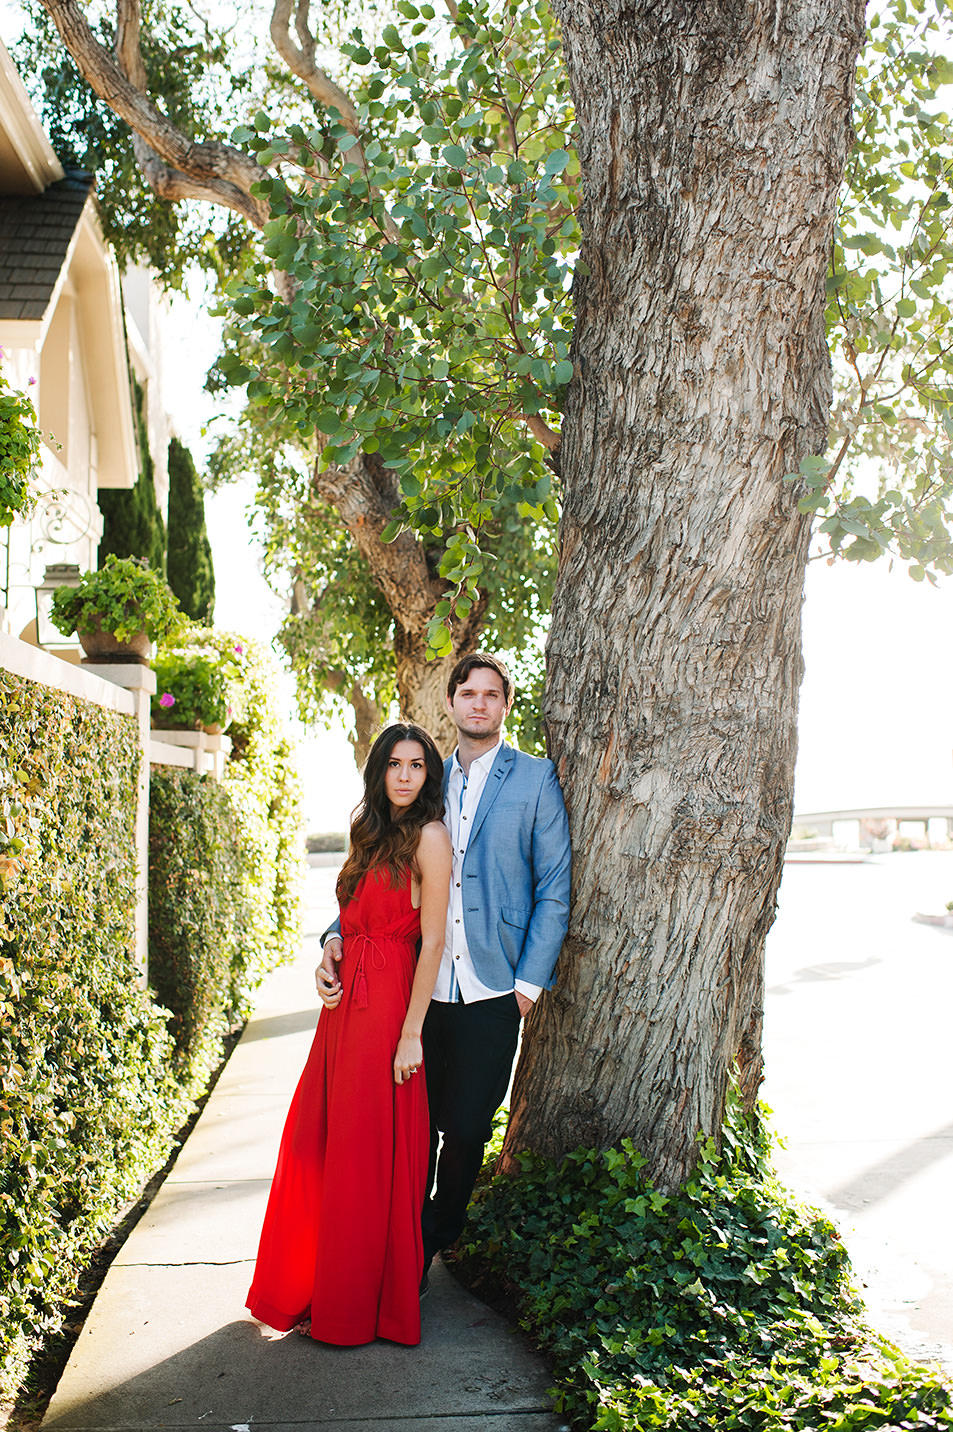 Malibu-California-engagement-photos-california-wedding-photographer30.jpg